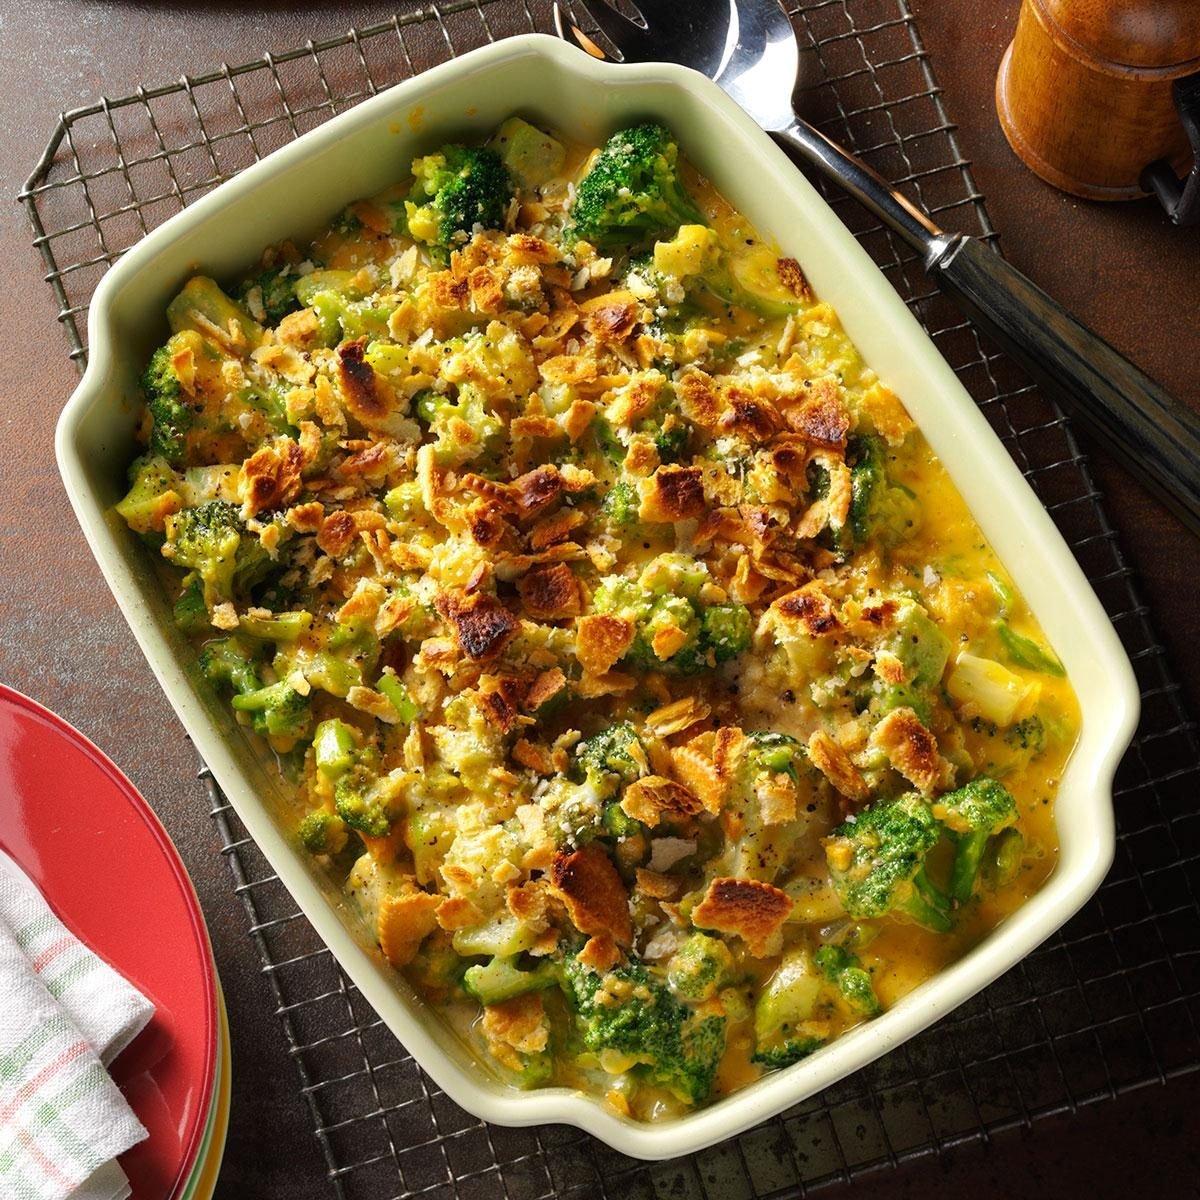 Crumb-Topped Broccoli Bake